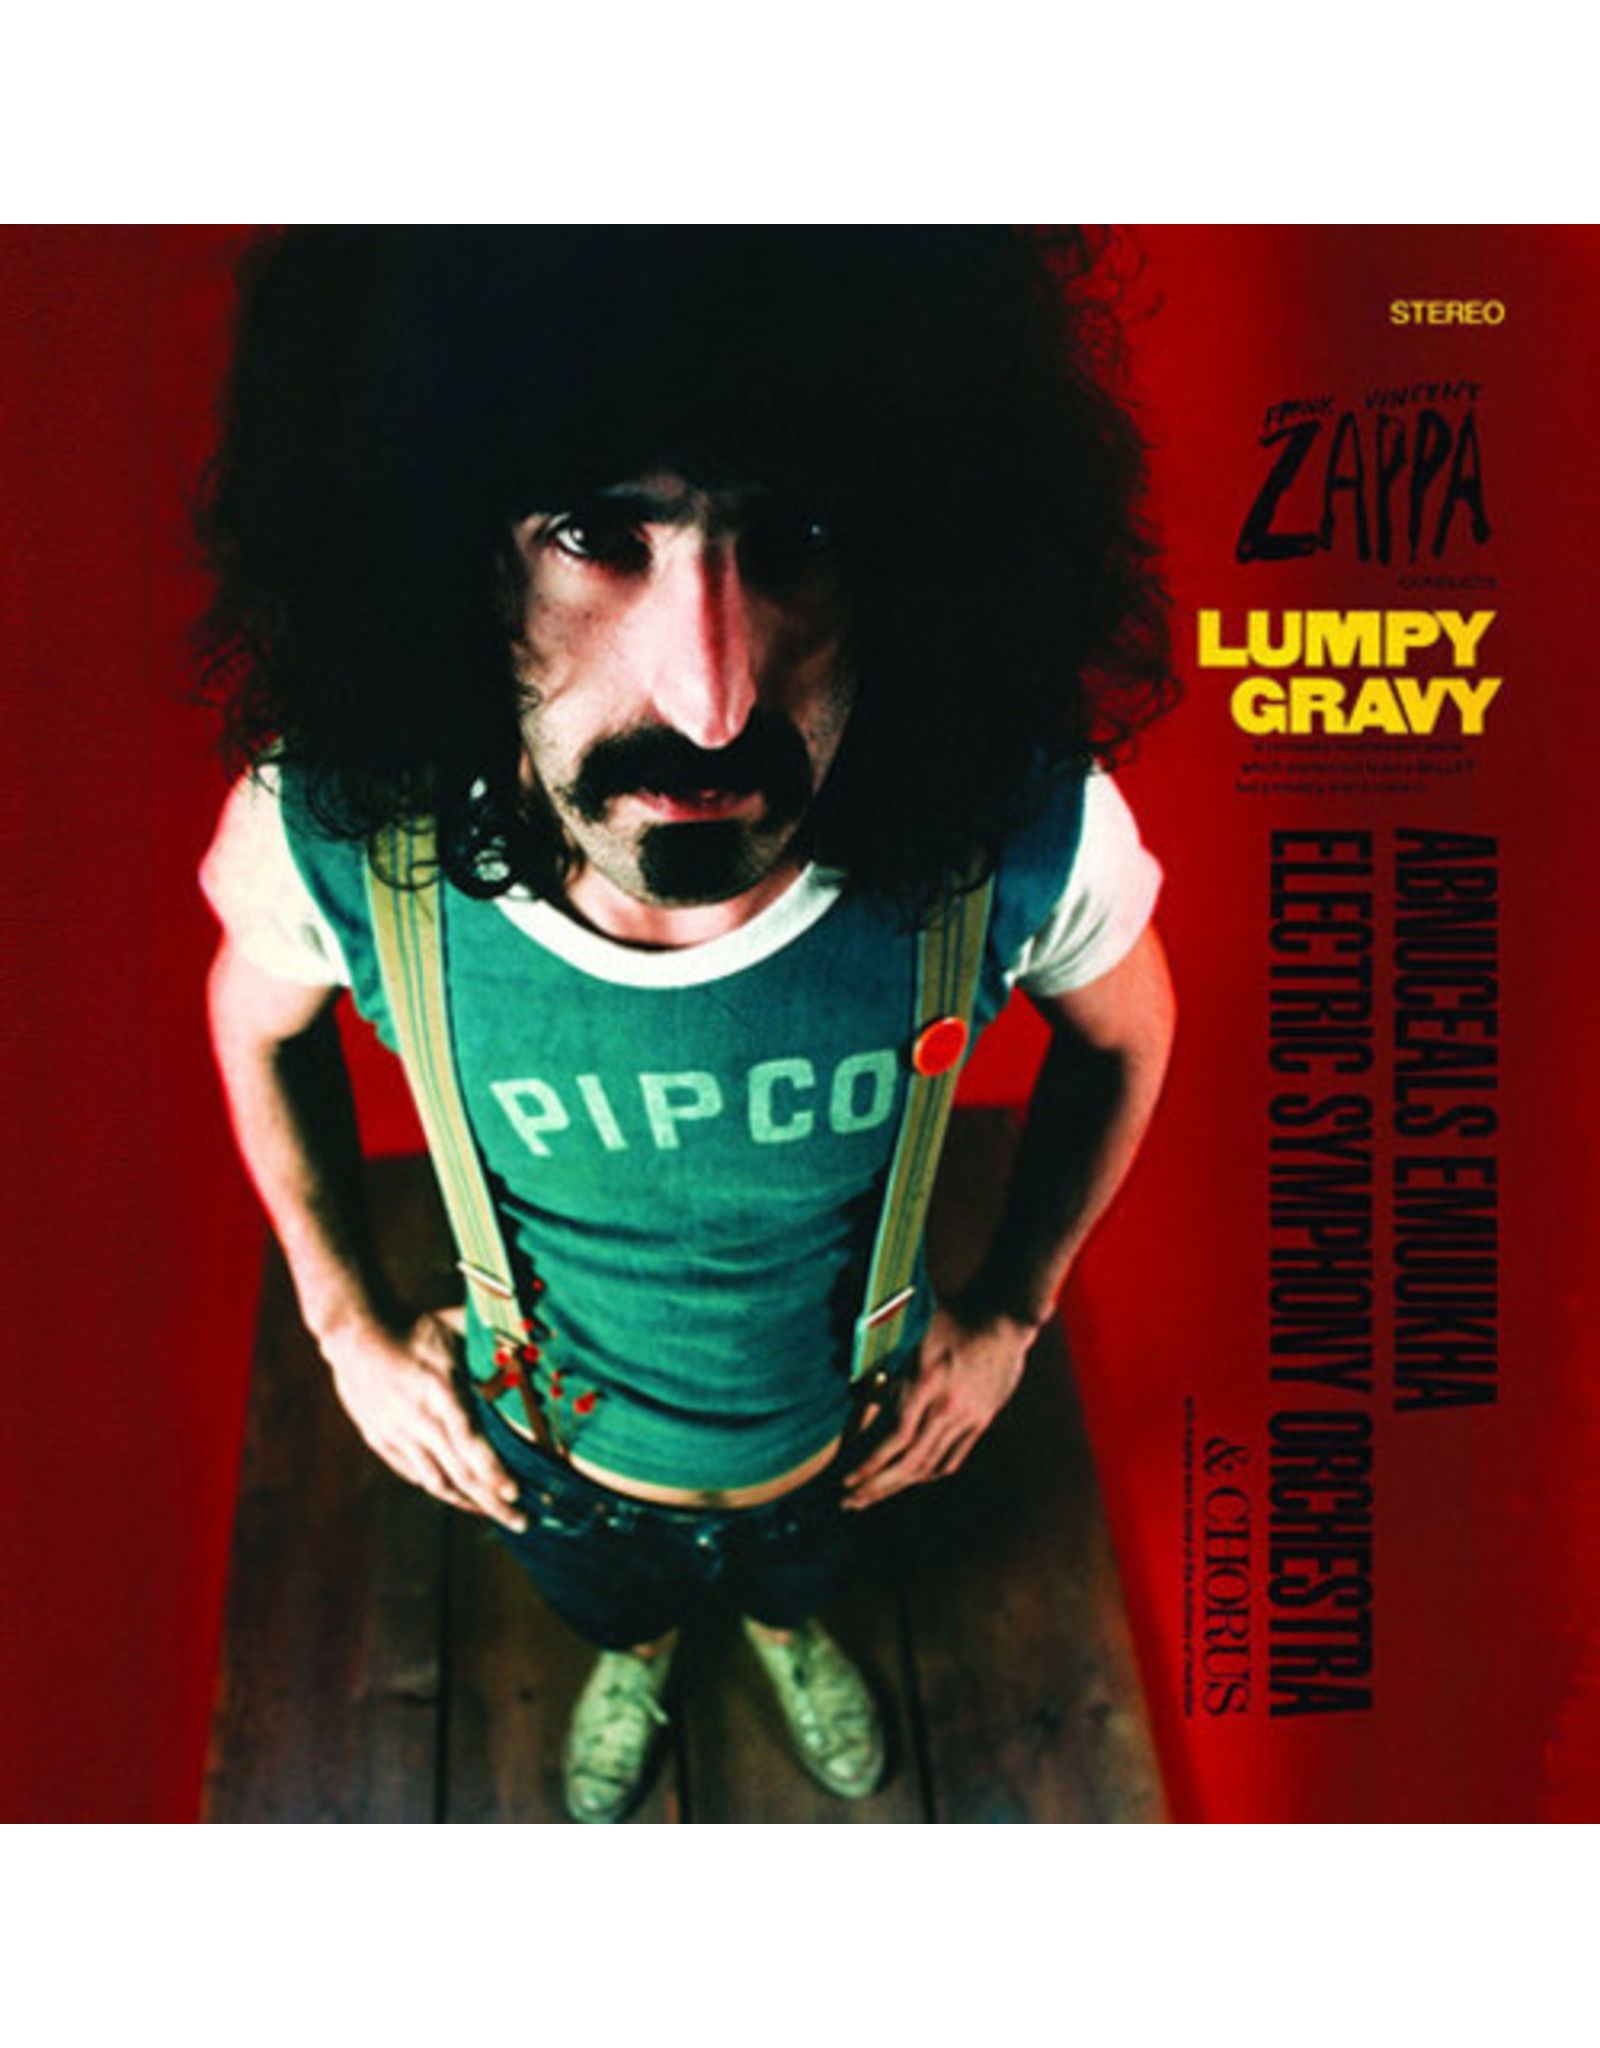 New Vinyl Frank Zappa - Lumpy Gravy LP